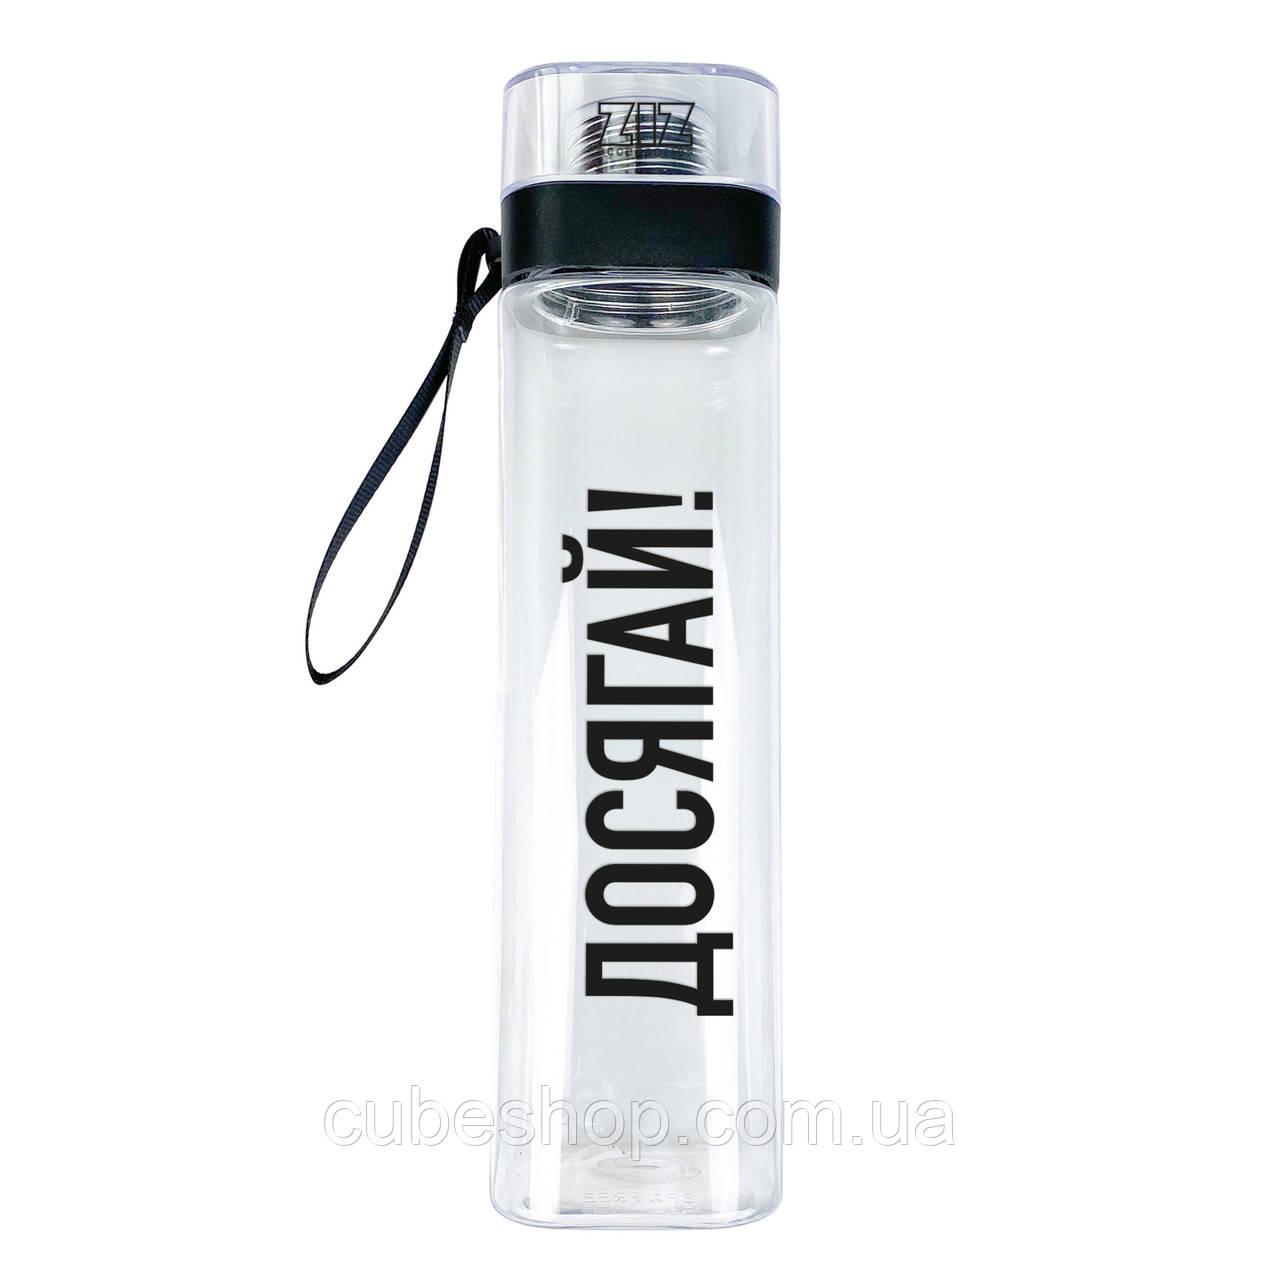 "Бутылка для воды ZIZ ""Досягай"" (700 мл)"